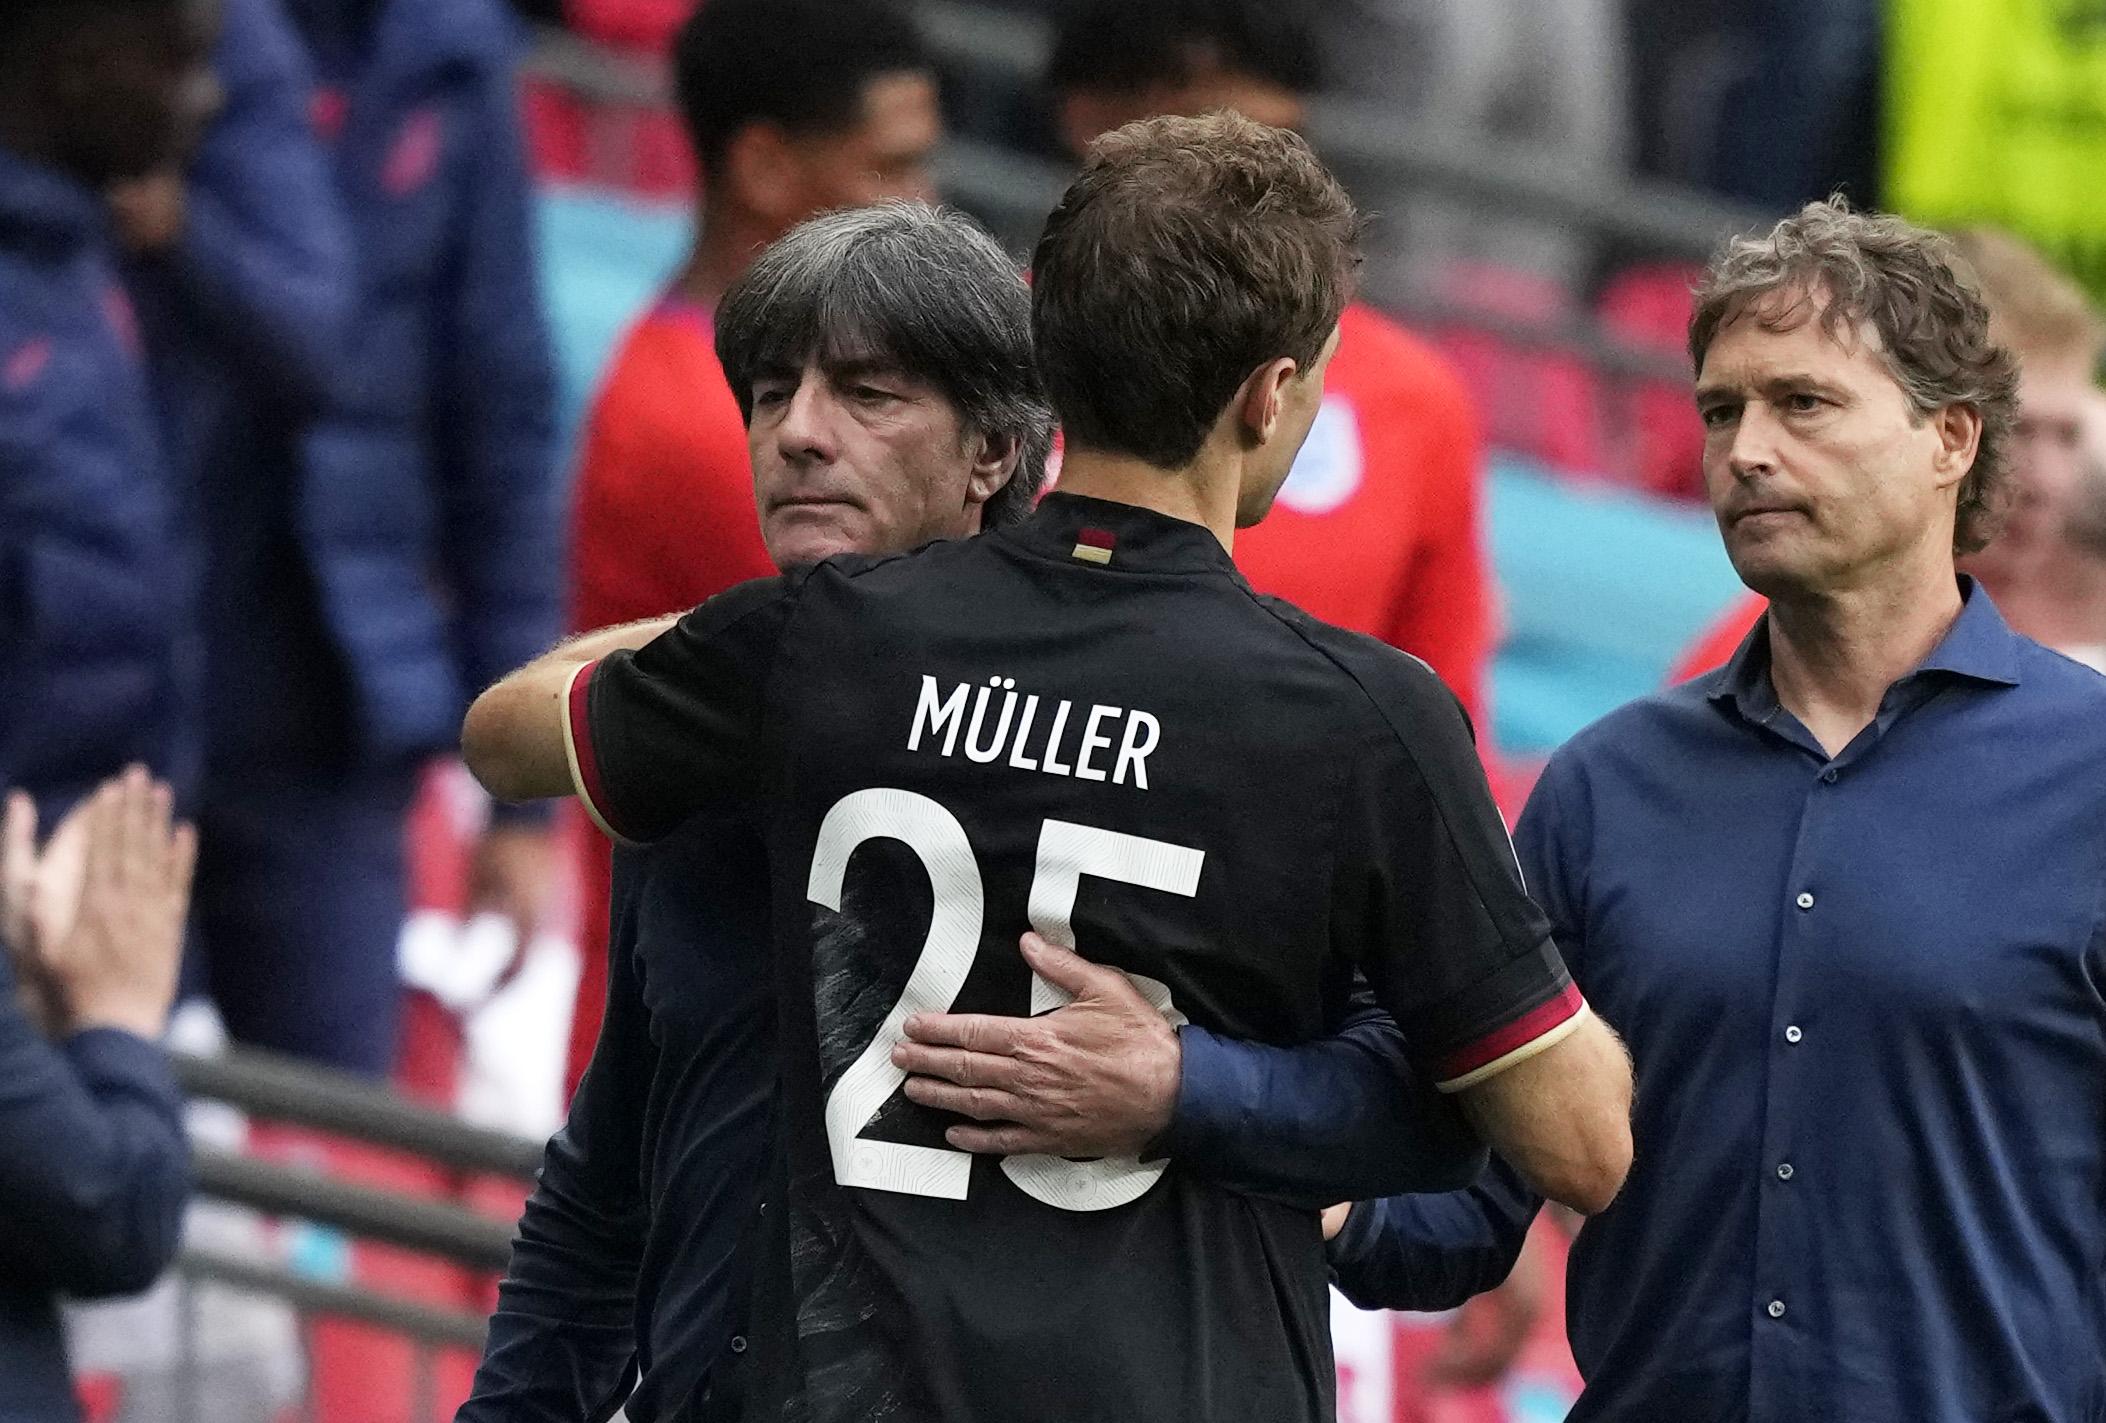 Low sedih ketika Muller datang untuk menghiburnya setelah kekalahan Inggris di Wembley.  Foto: DFB